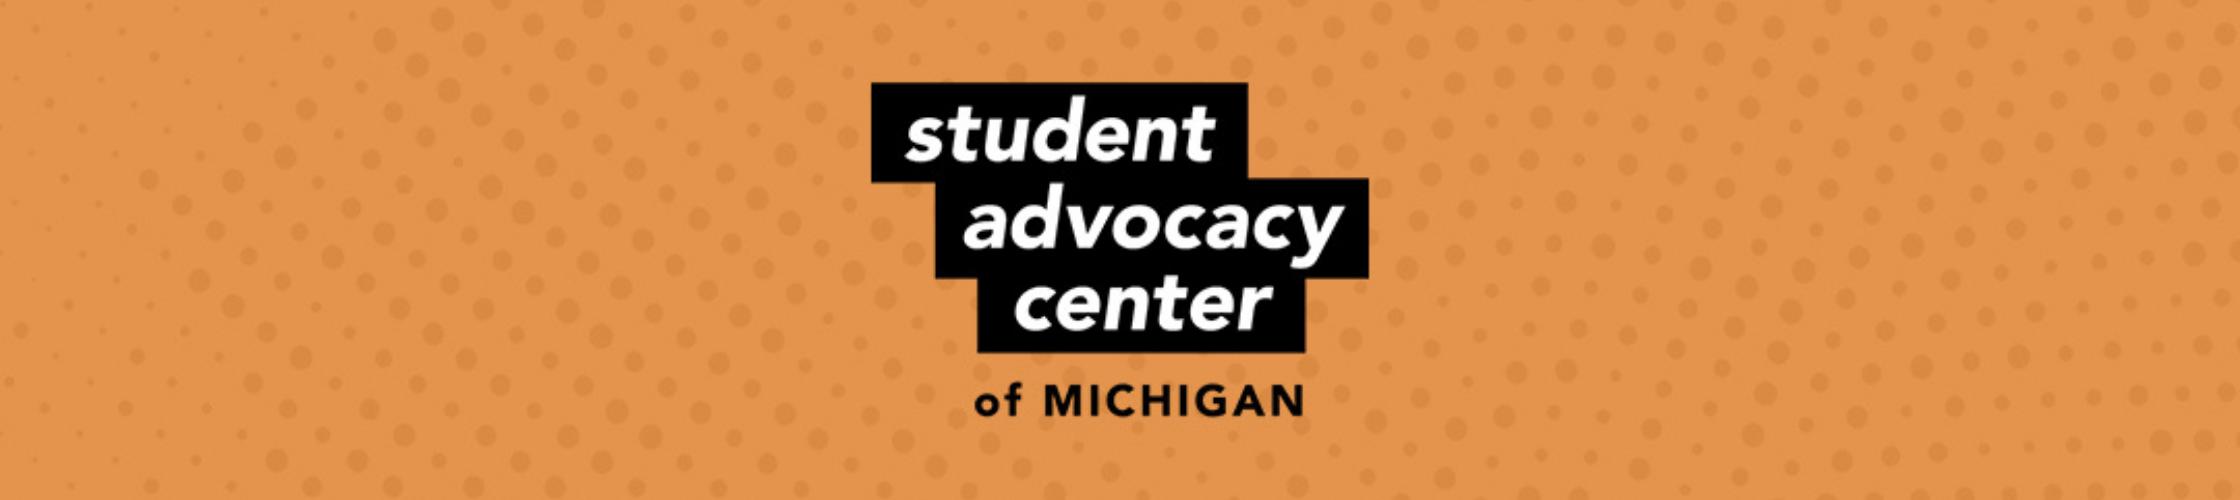 Student Advocacy Center of Michigan